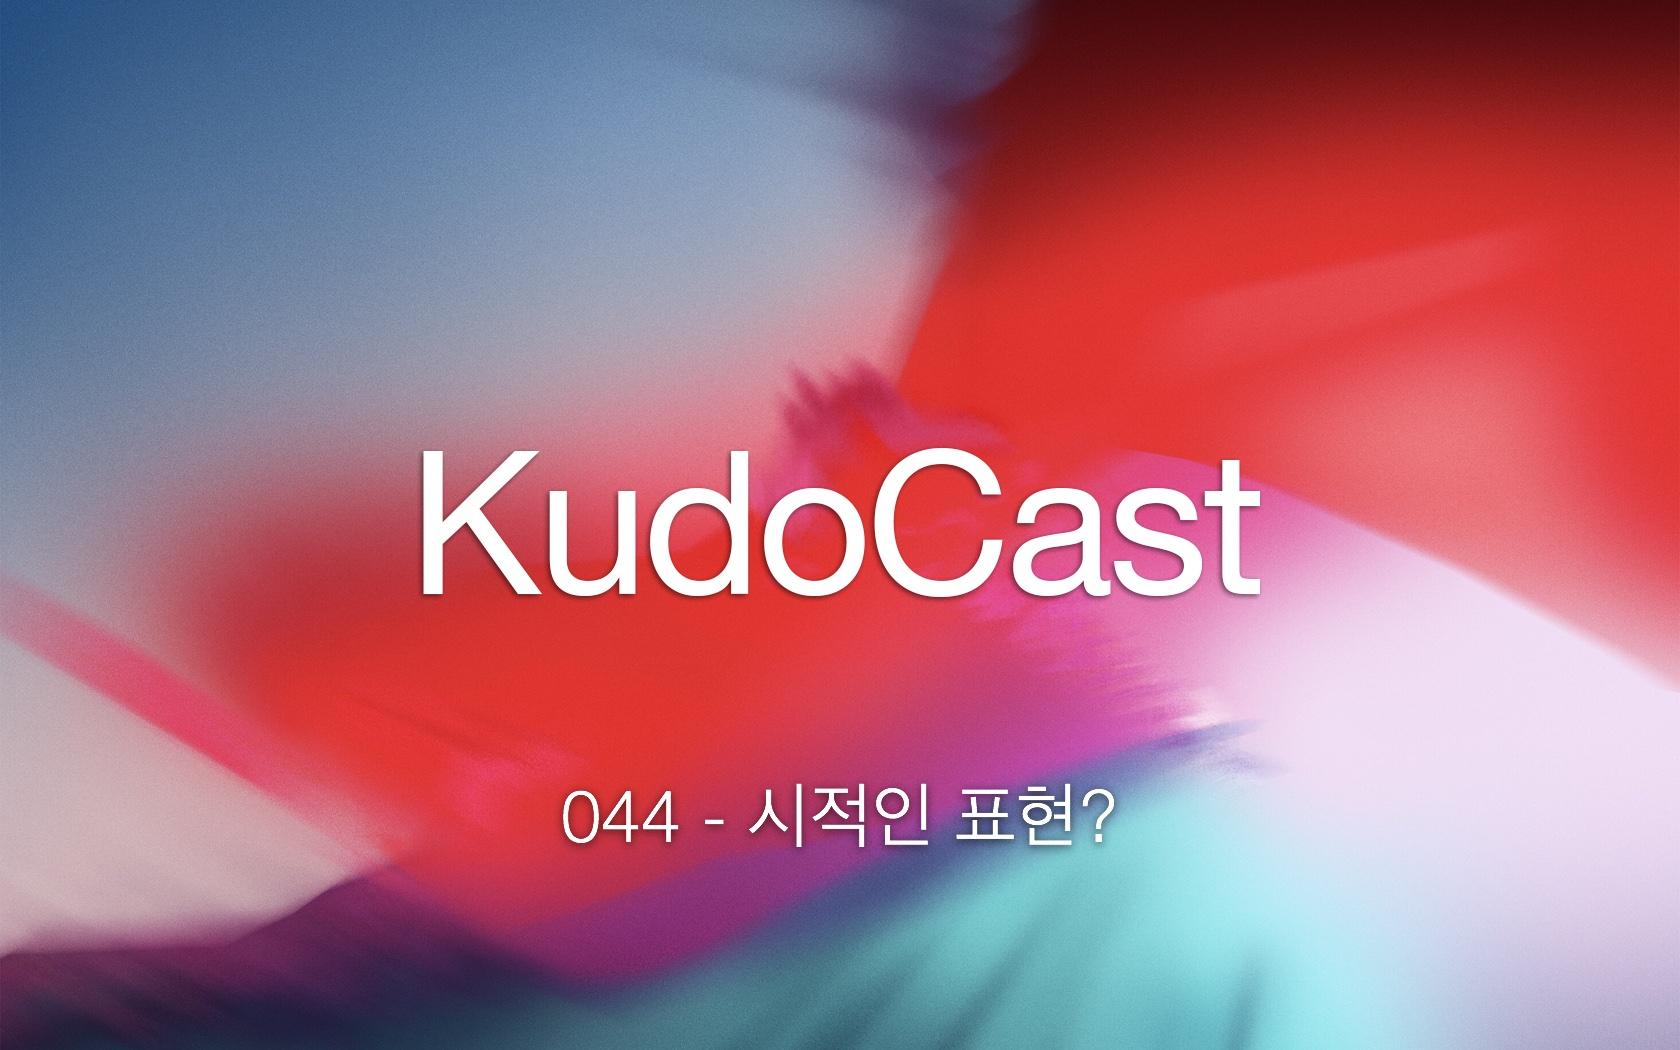 KudoCast 044.jpg